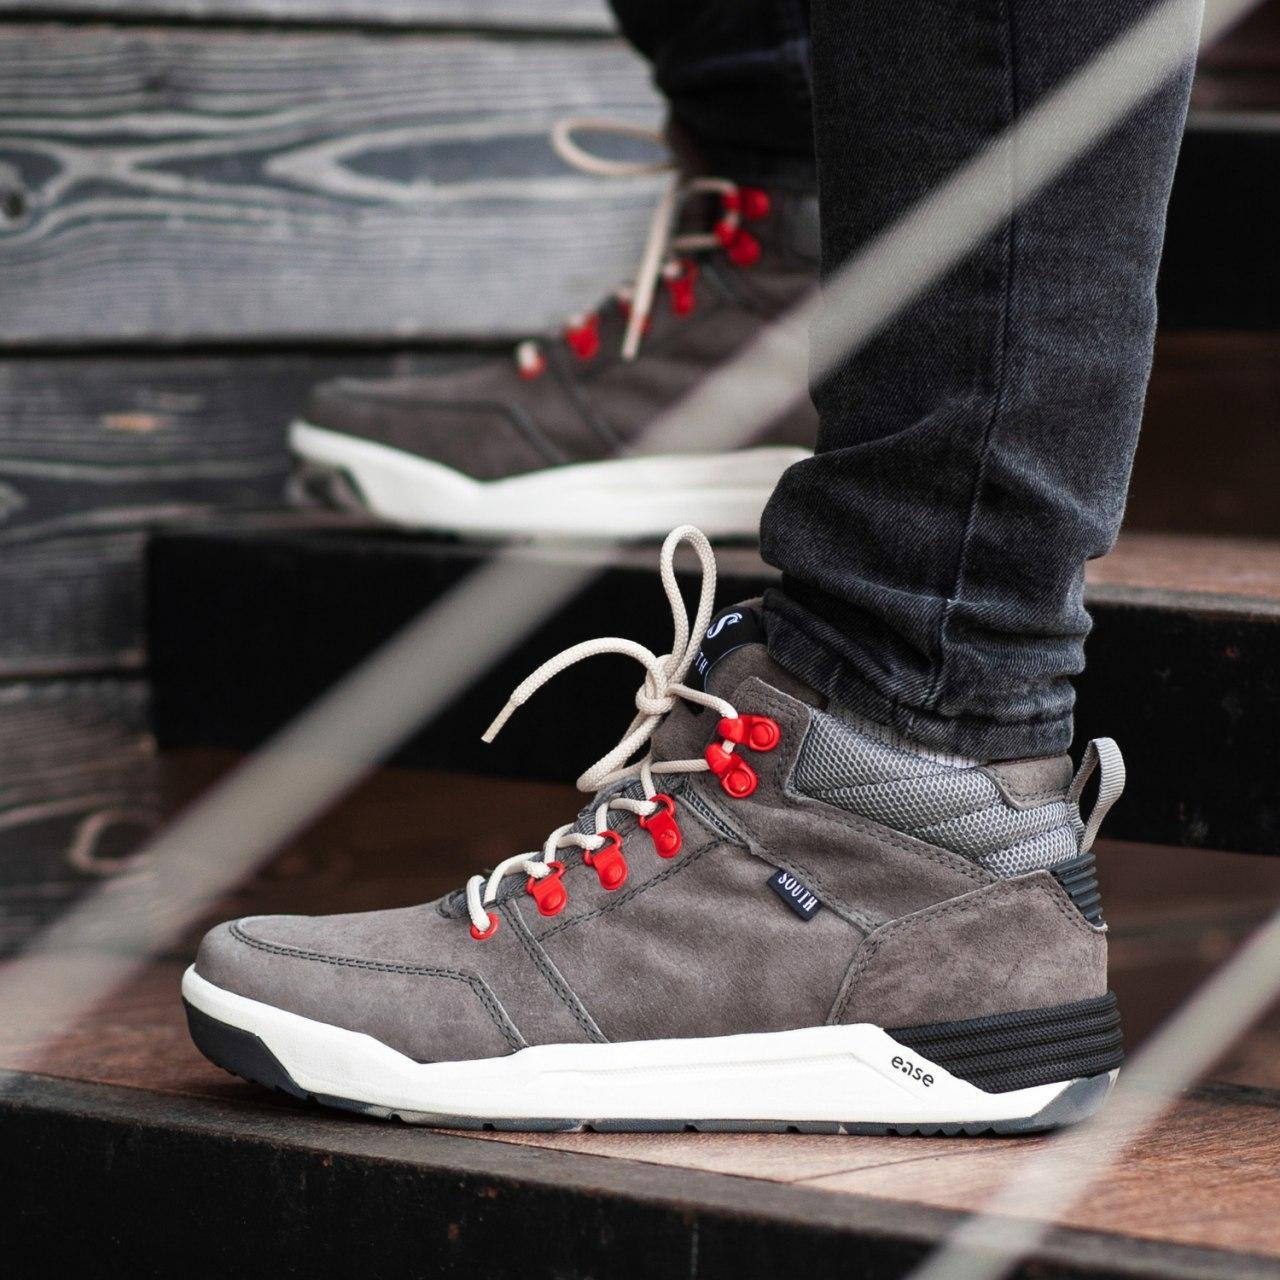 Ботинки South fenix grey - фото 1